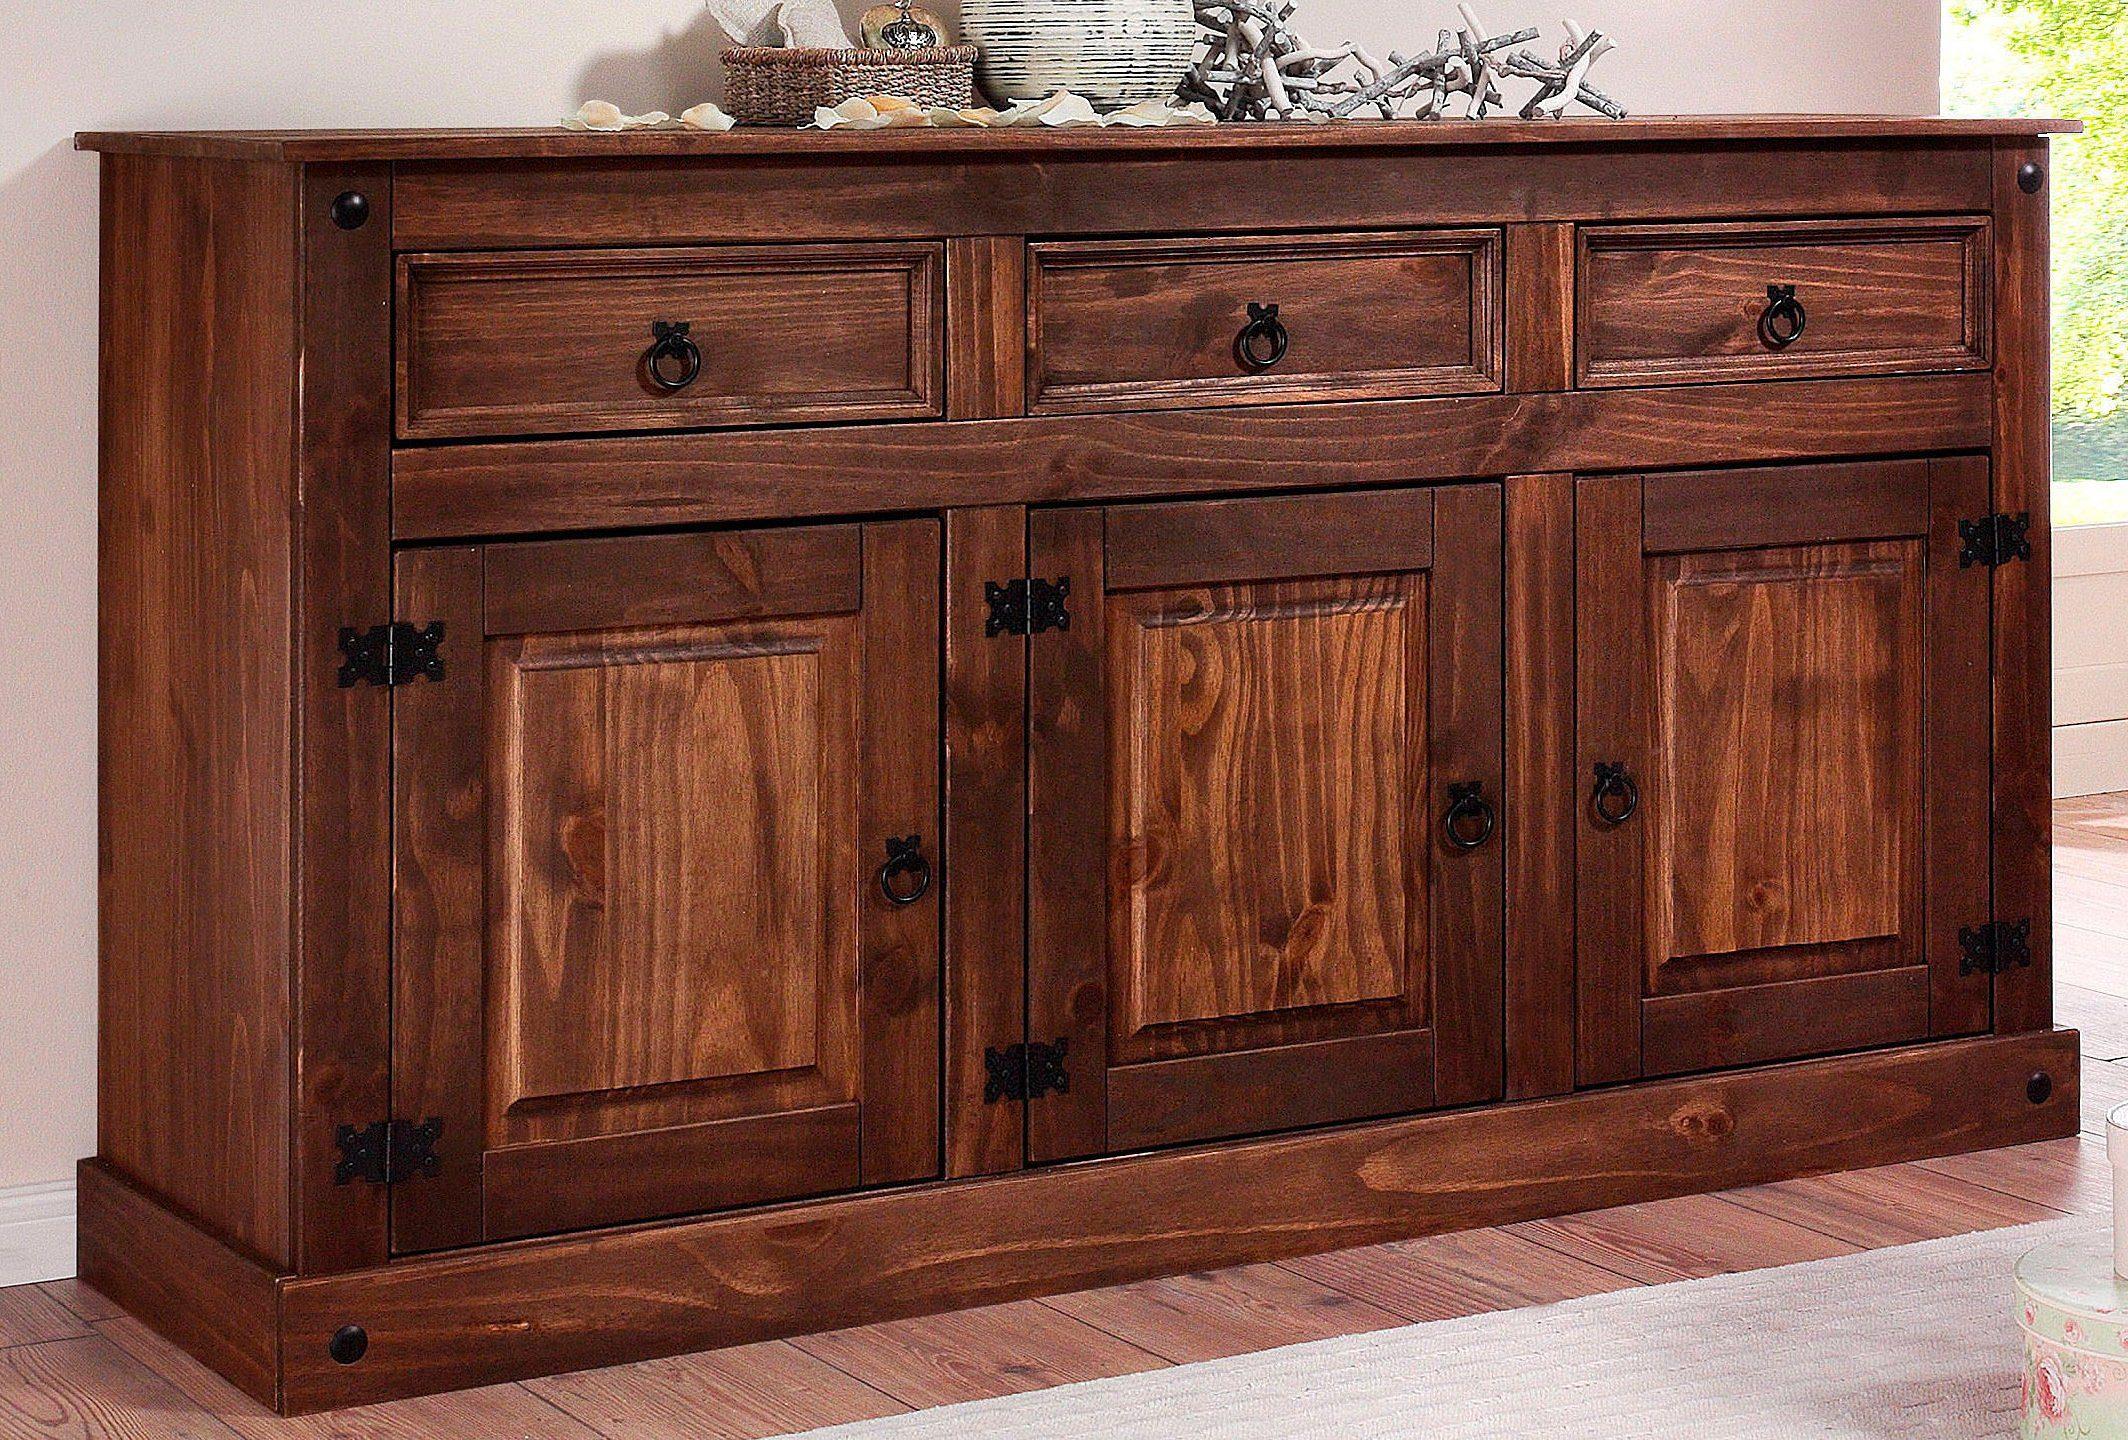 Sideboard, Home affaire, Breite 151 cm, Höhe 84 cm